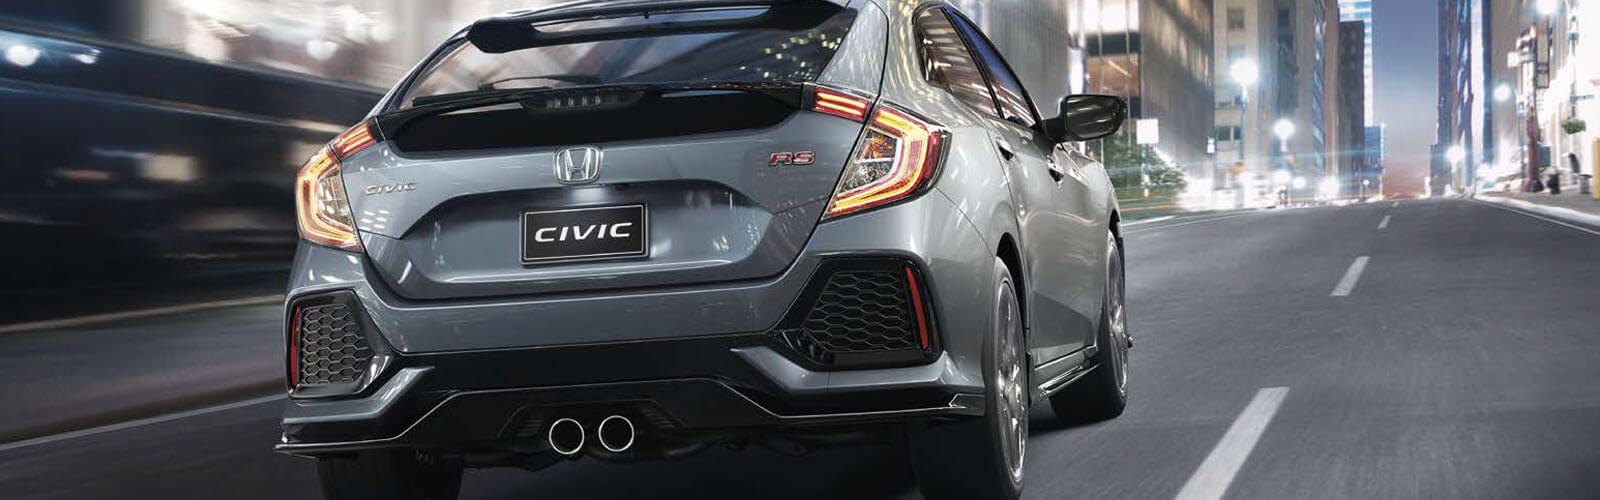 New Honda Civic Hatch For Sale In Shepparton Darryl Twitt Honda